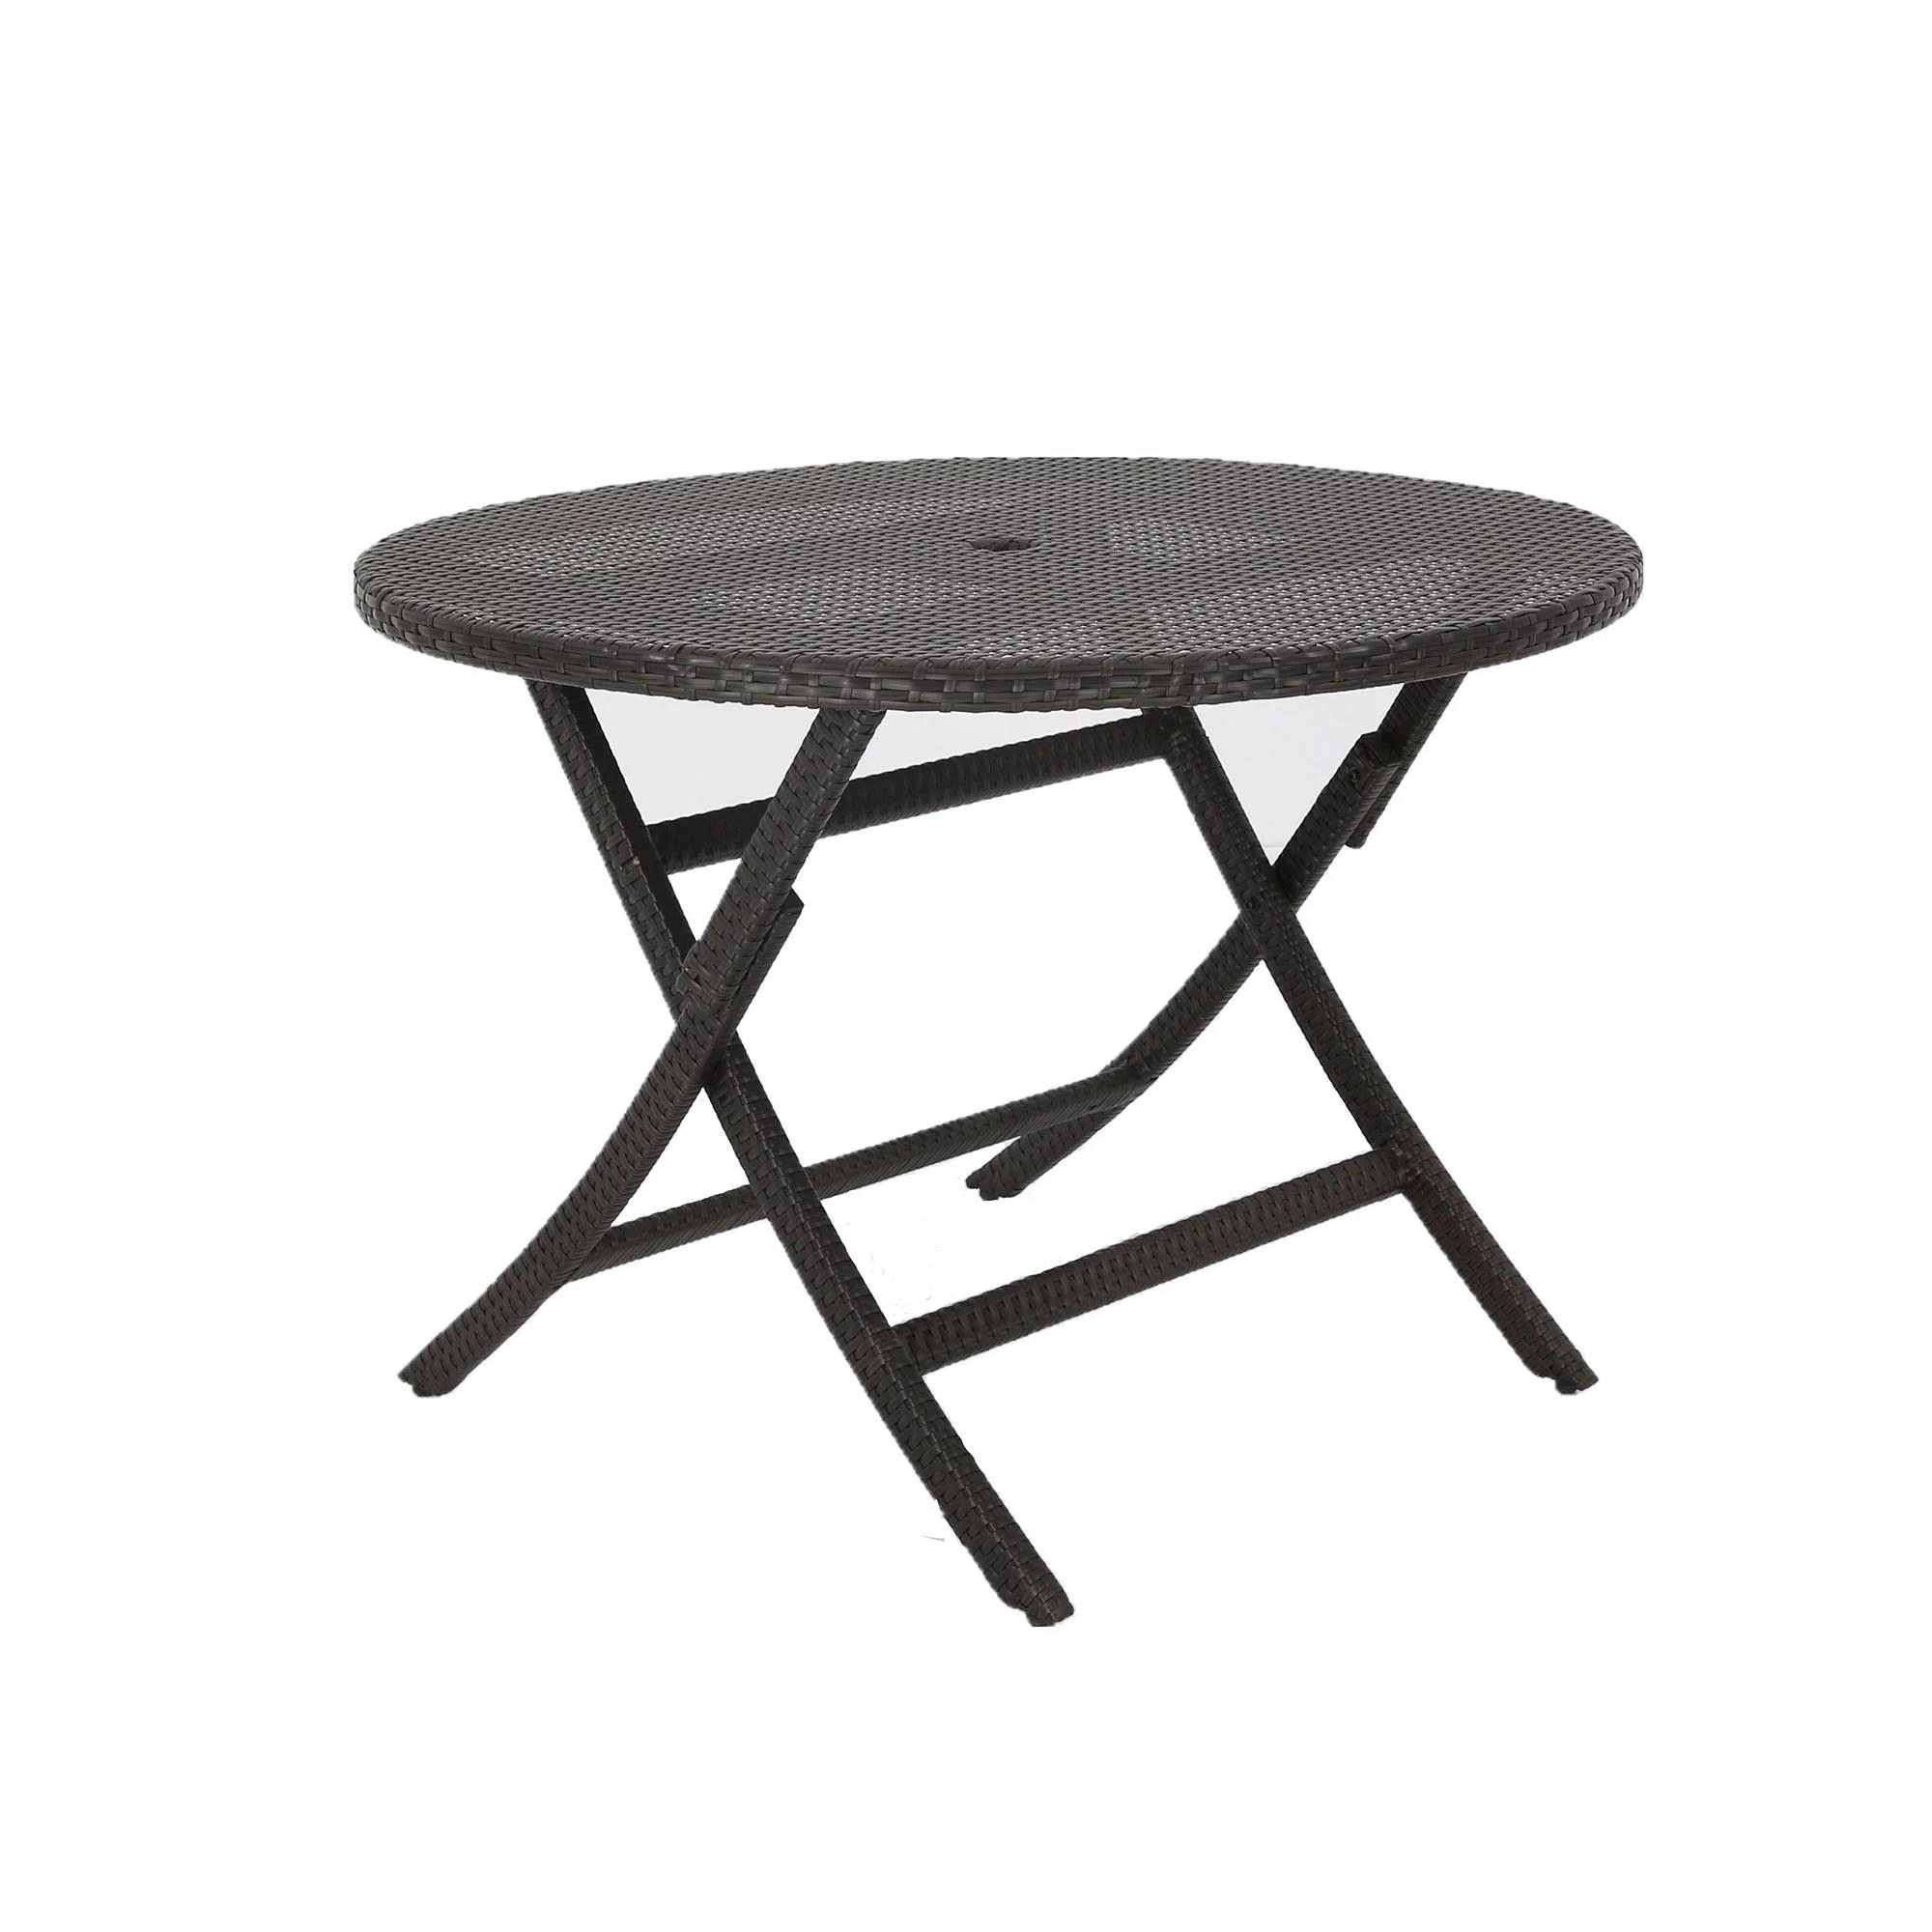 baner garden e07 outdoor furniture resin wicker rattan folding aluminum round table with umbrella hole black